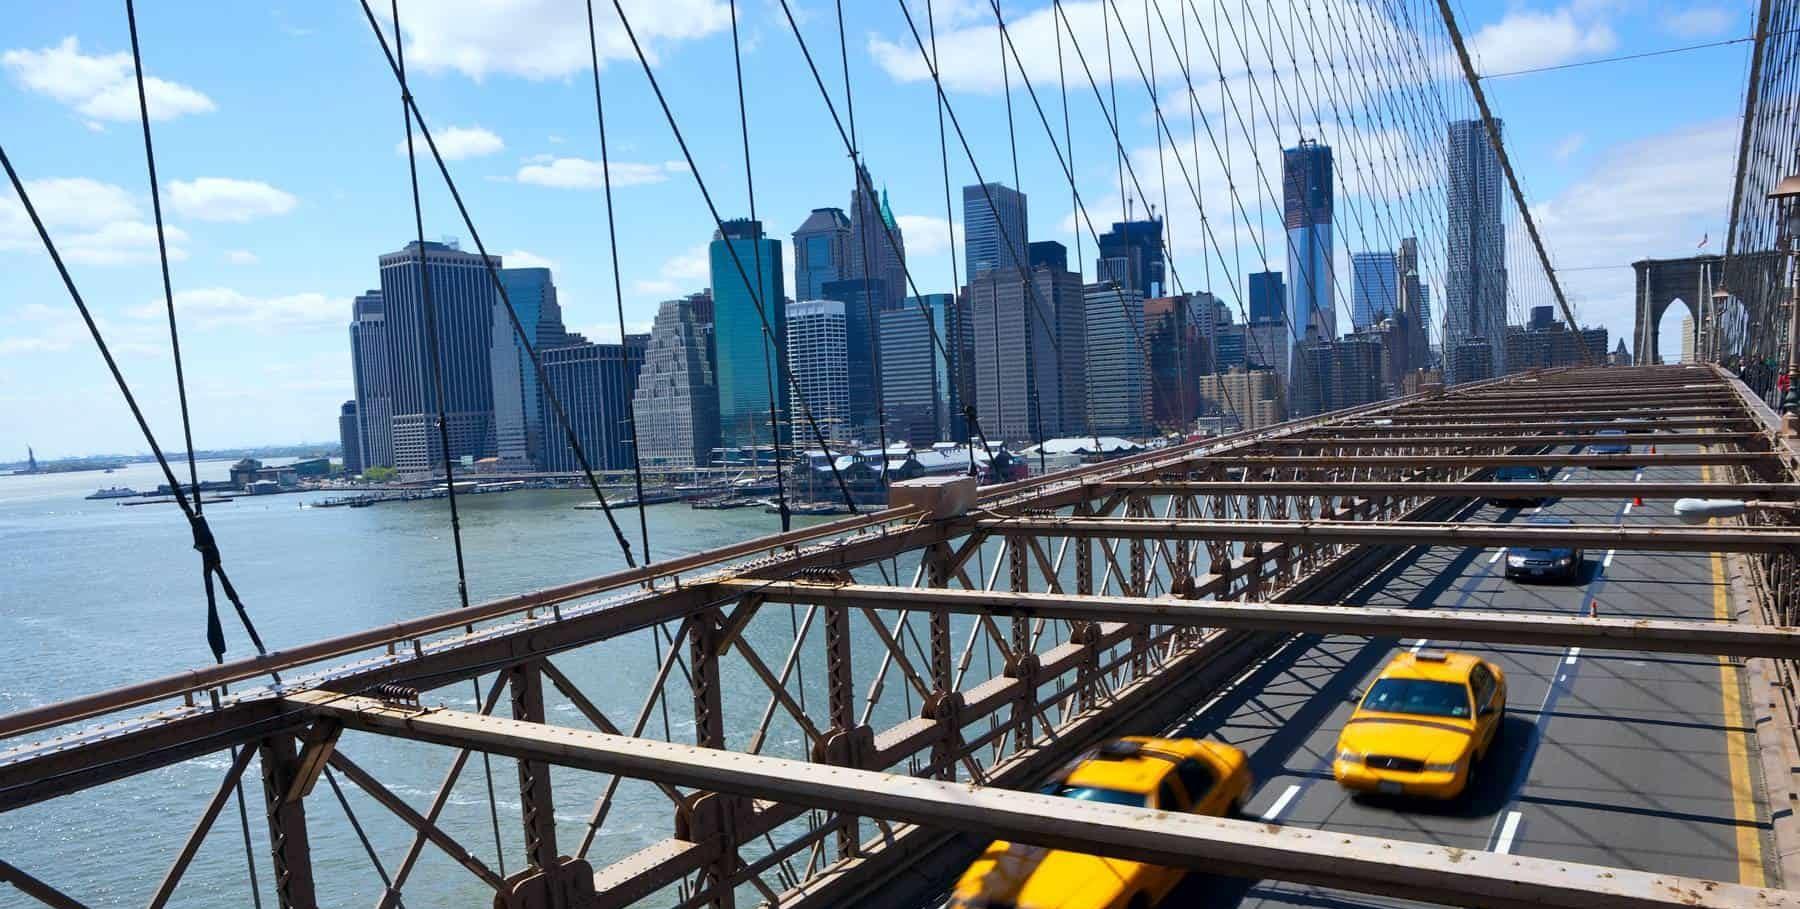 New York City - Booklyn Bridge